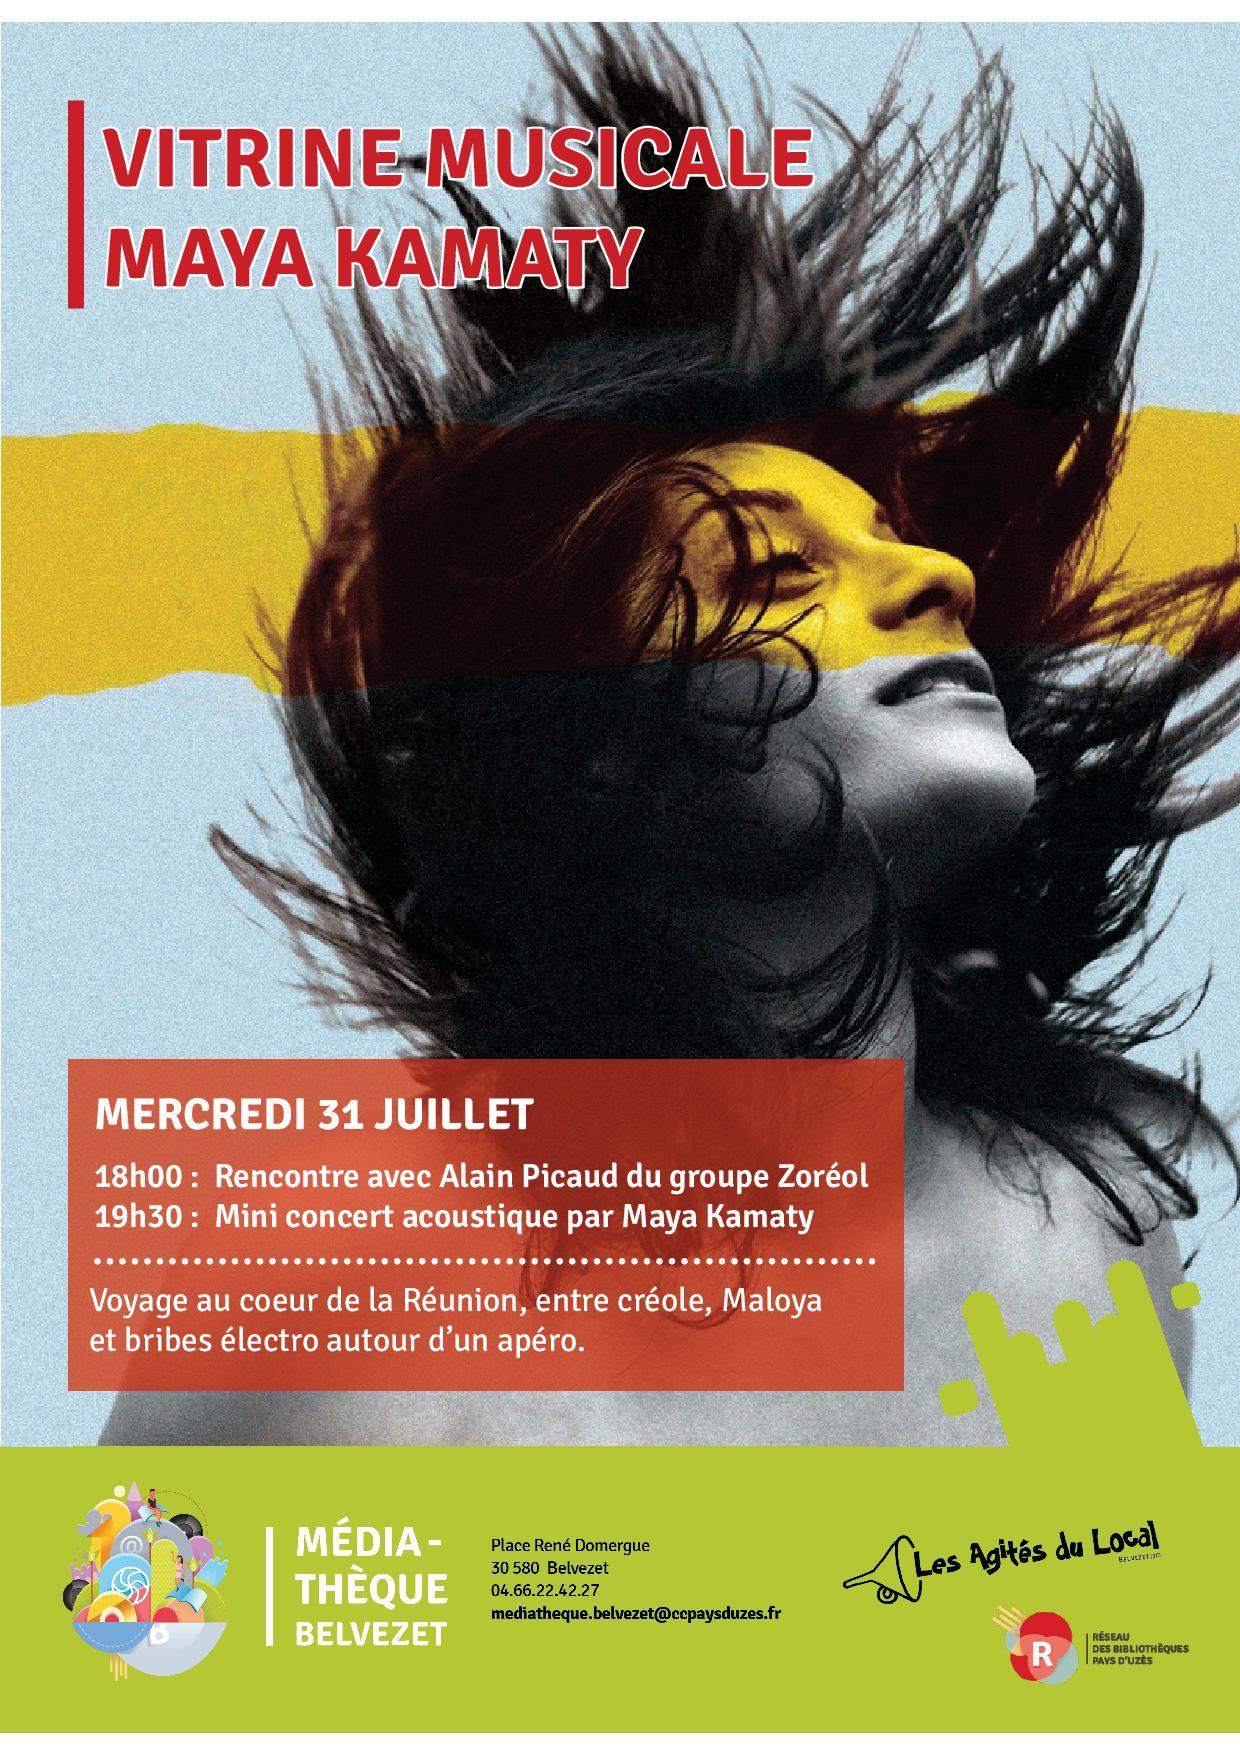 Vitrine musicale Maya Kamaty